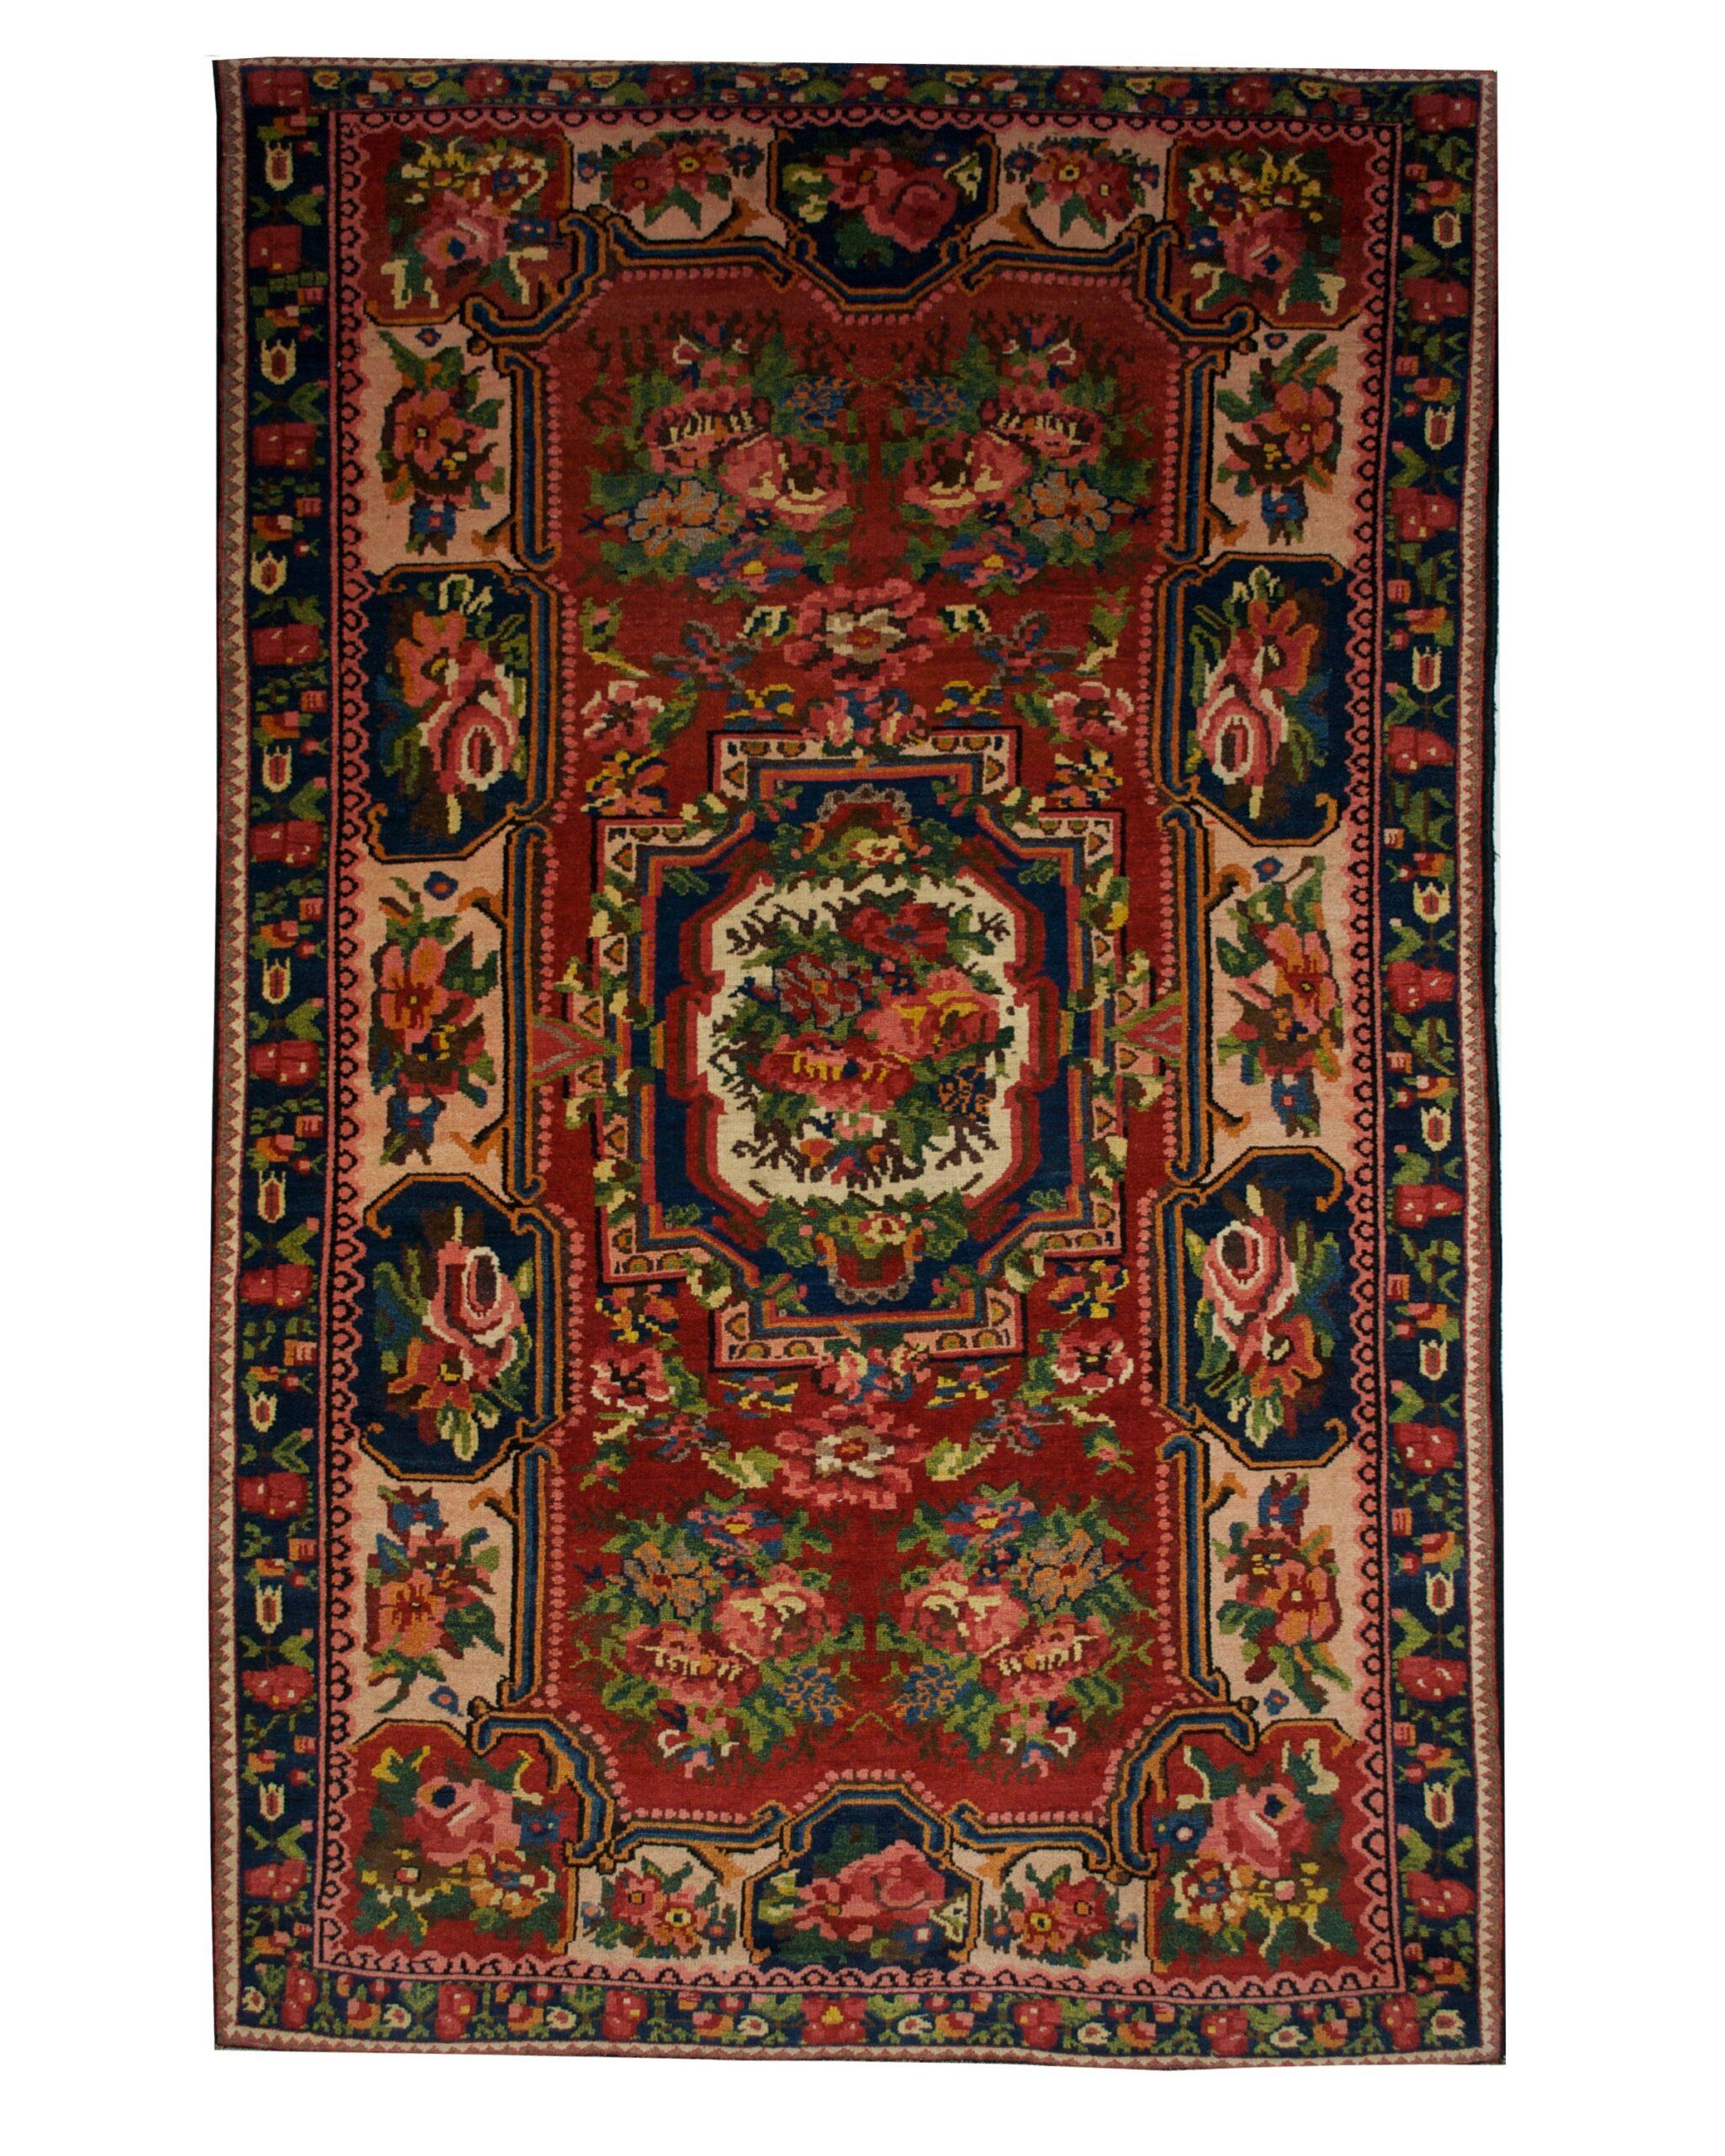 "Antique Persian Bakhtiari 4' 10"" x 7' 10"" Handmade Wool Area Rug - Shabahang Royal Carpet"